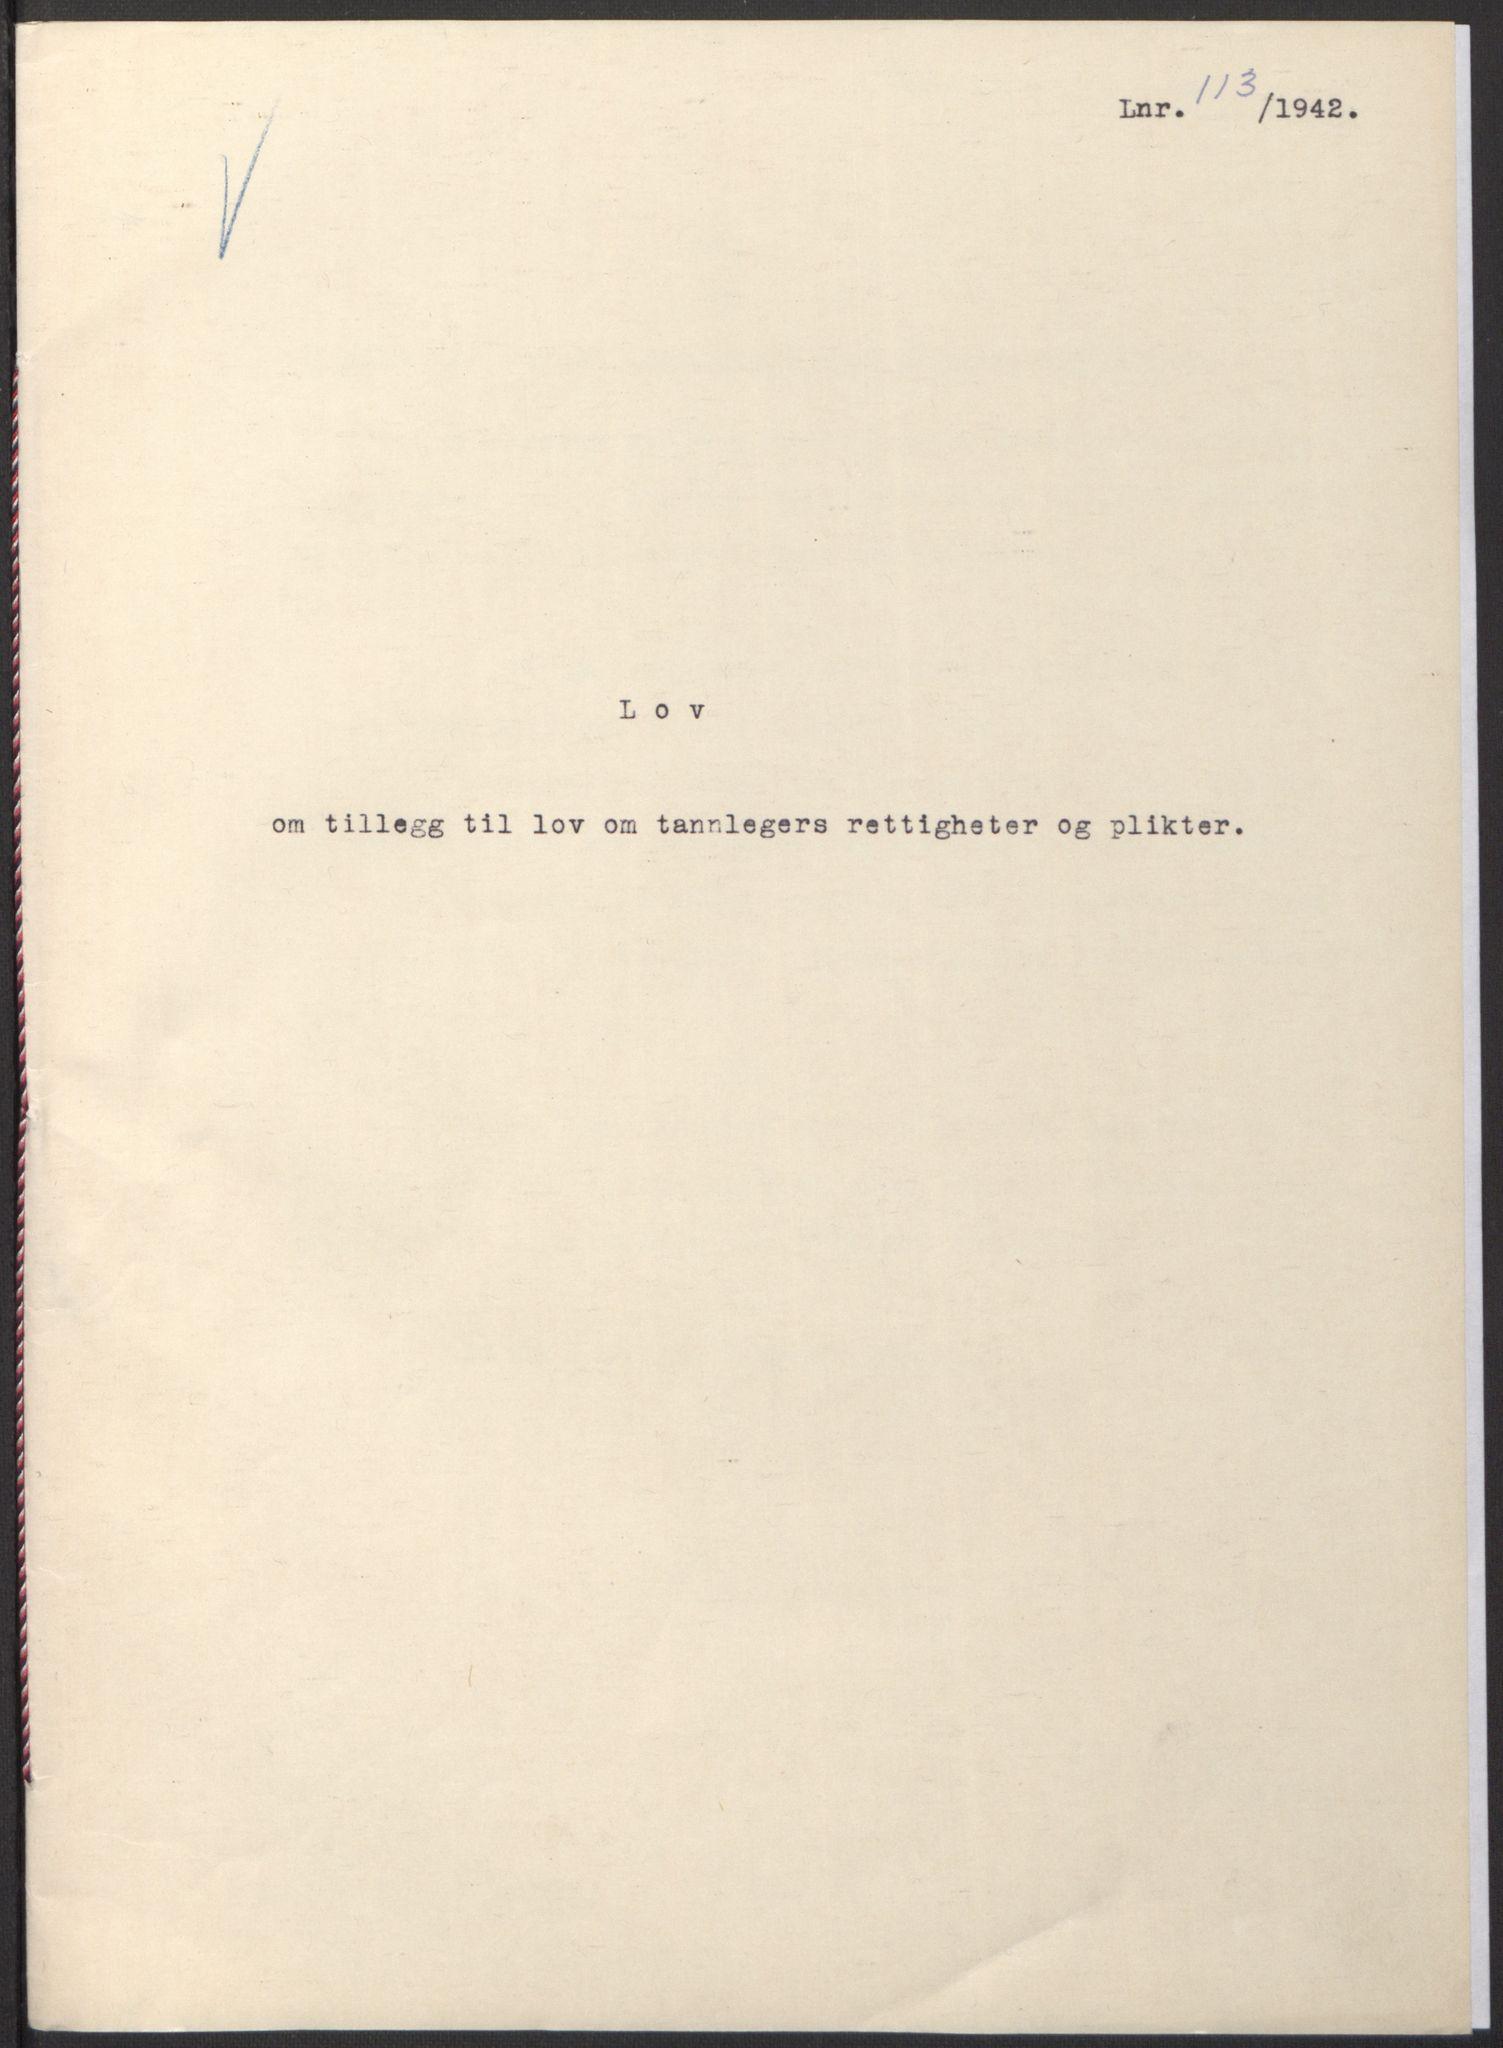 RA, NS-administrasjonen 1940-1945 (Statsrådsekretariatet, de kommisariske statsråder mm), D/Db/L0097: Lover I, 1942, s. upaginert